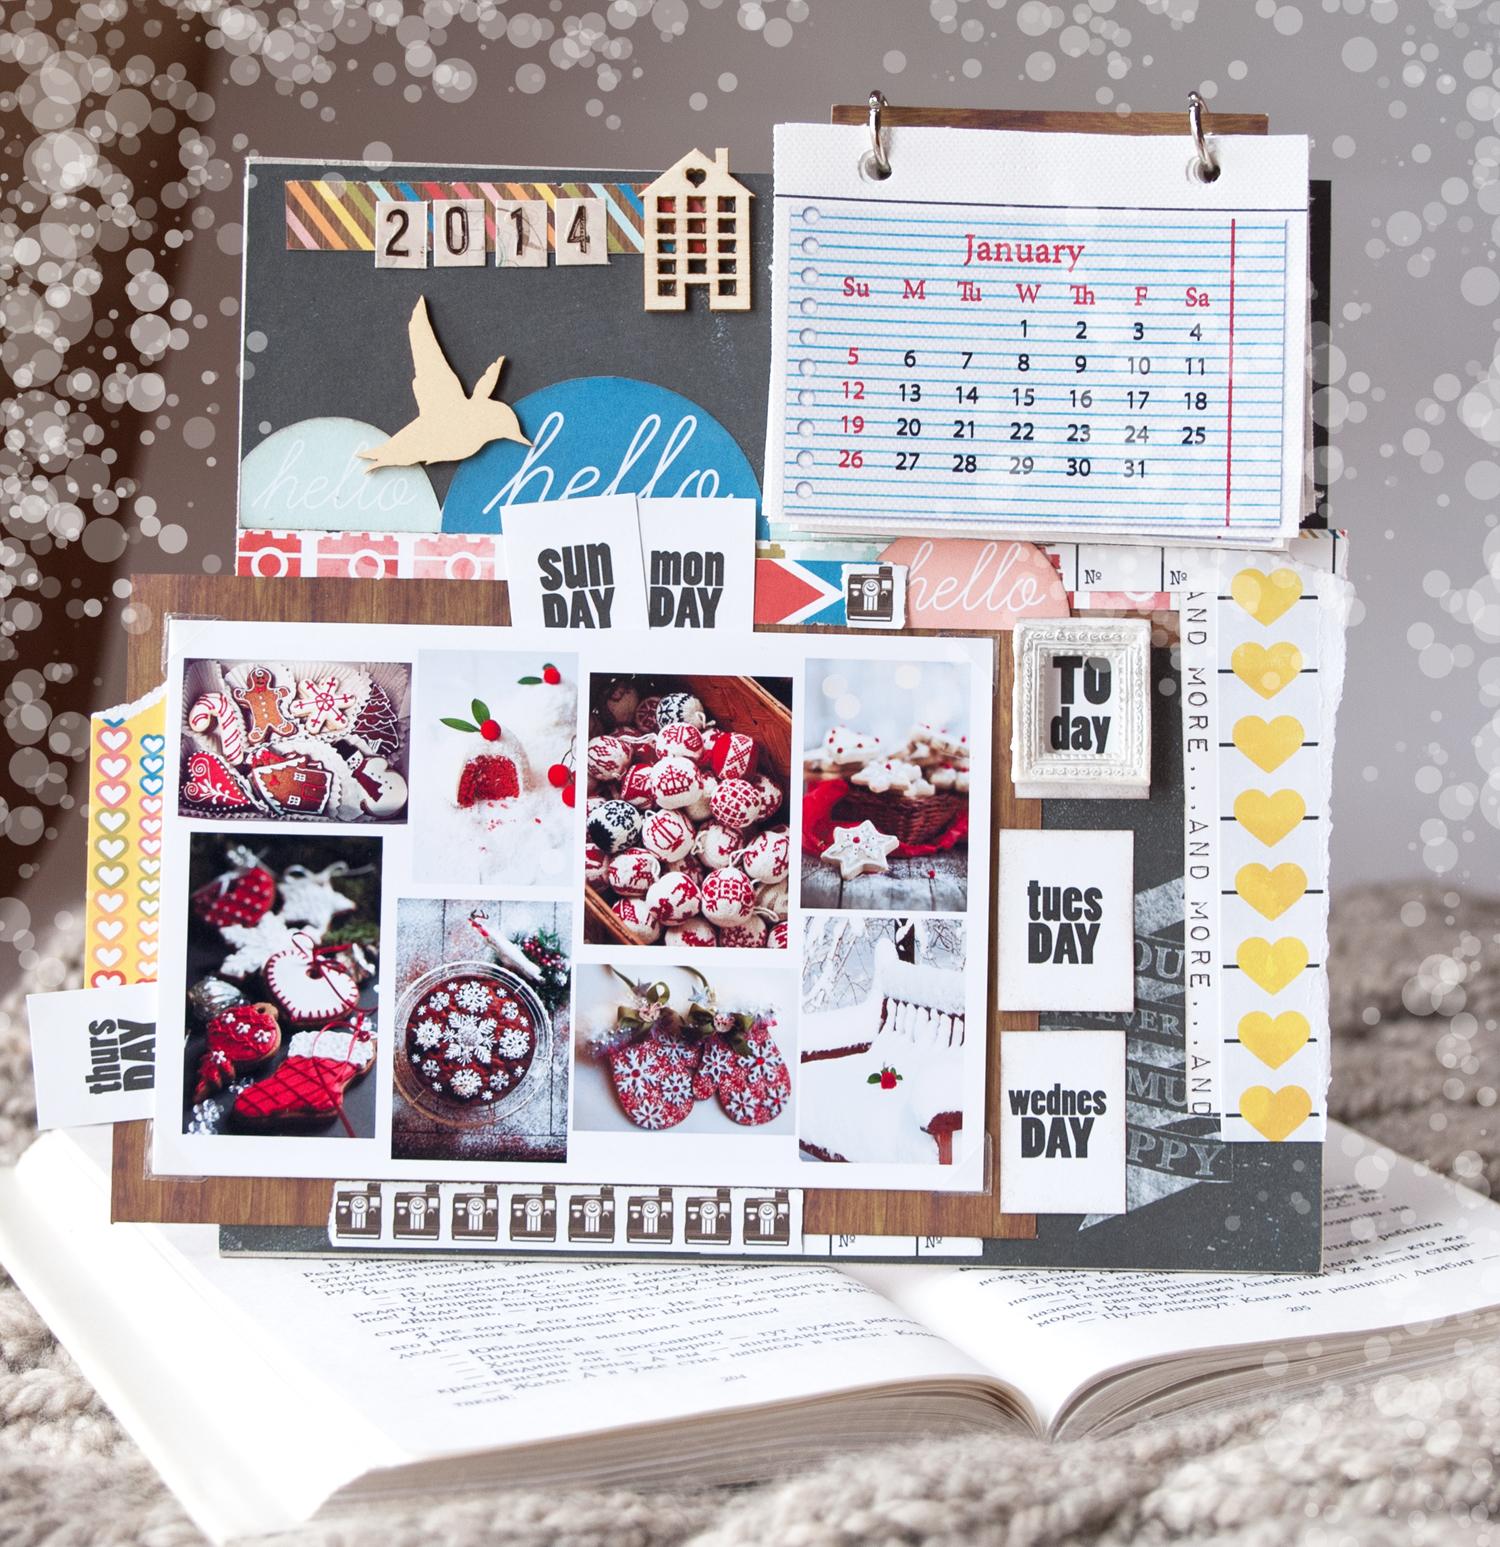 календарь+рамка+фото+скрапбукинг+glitz